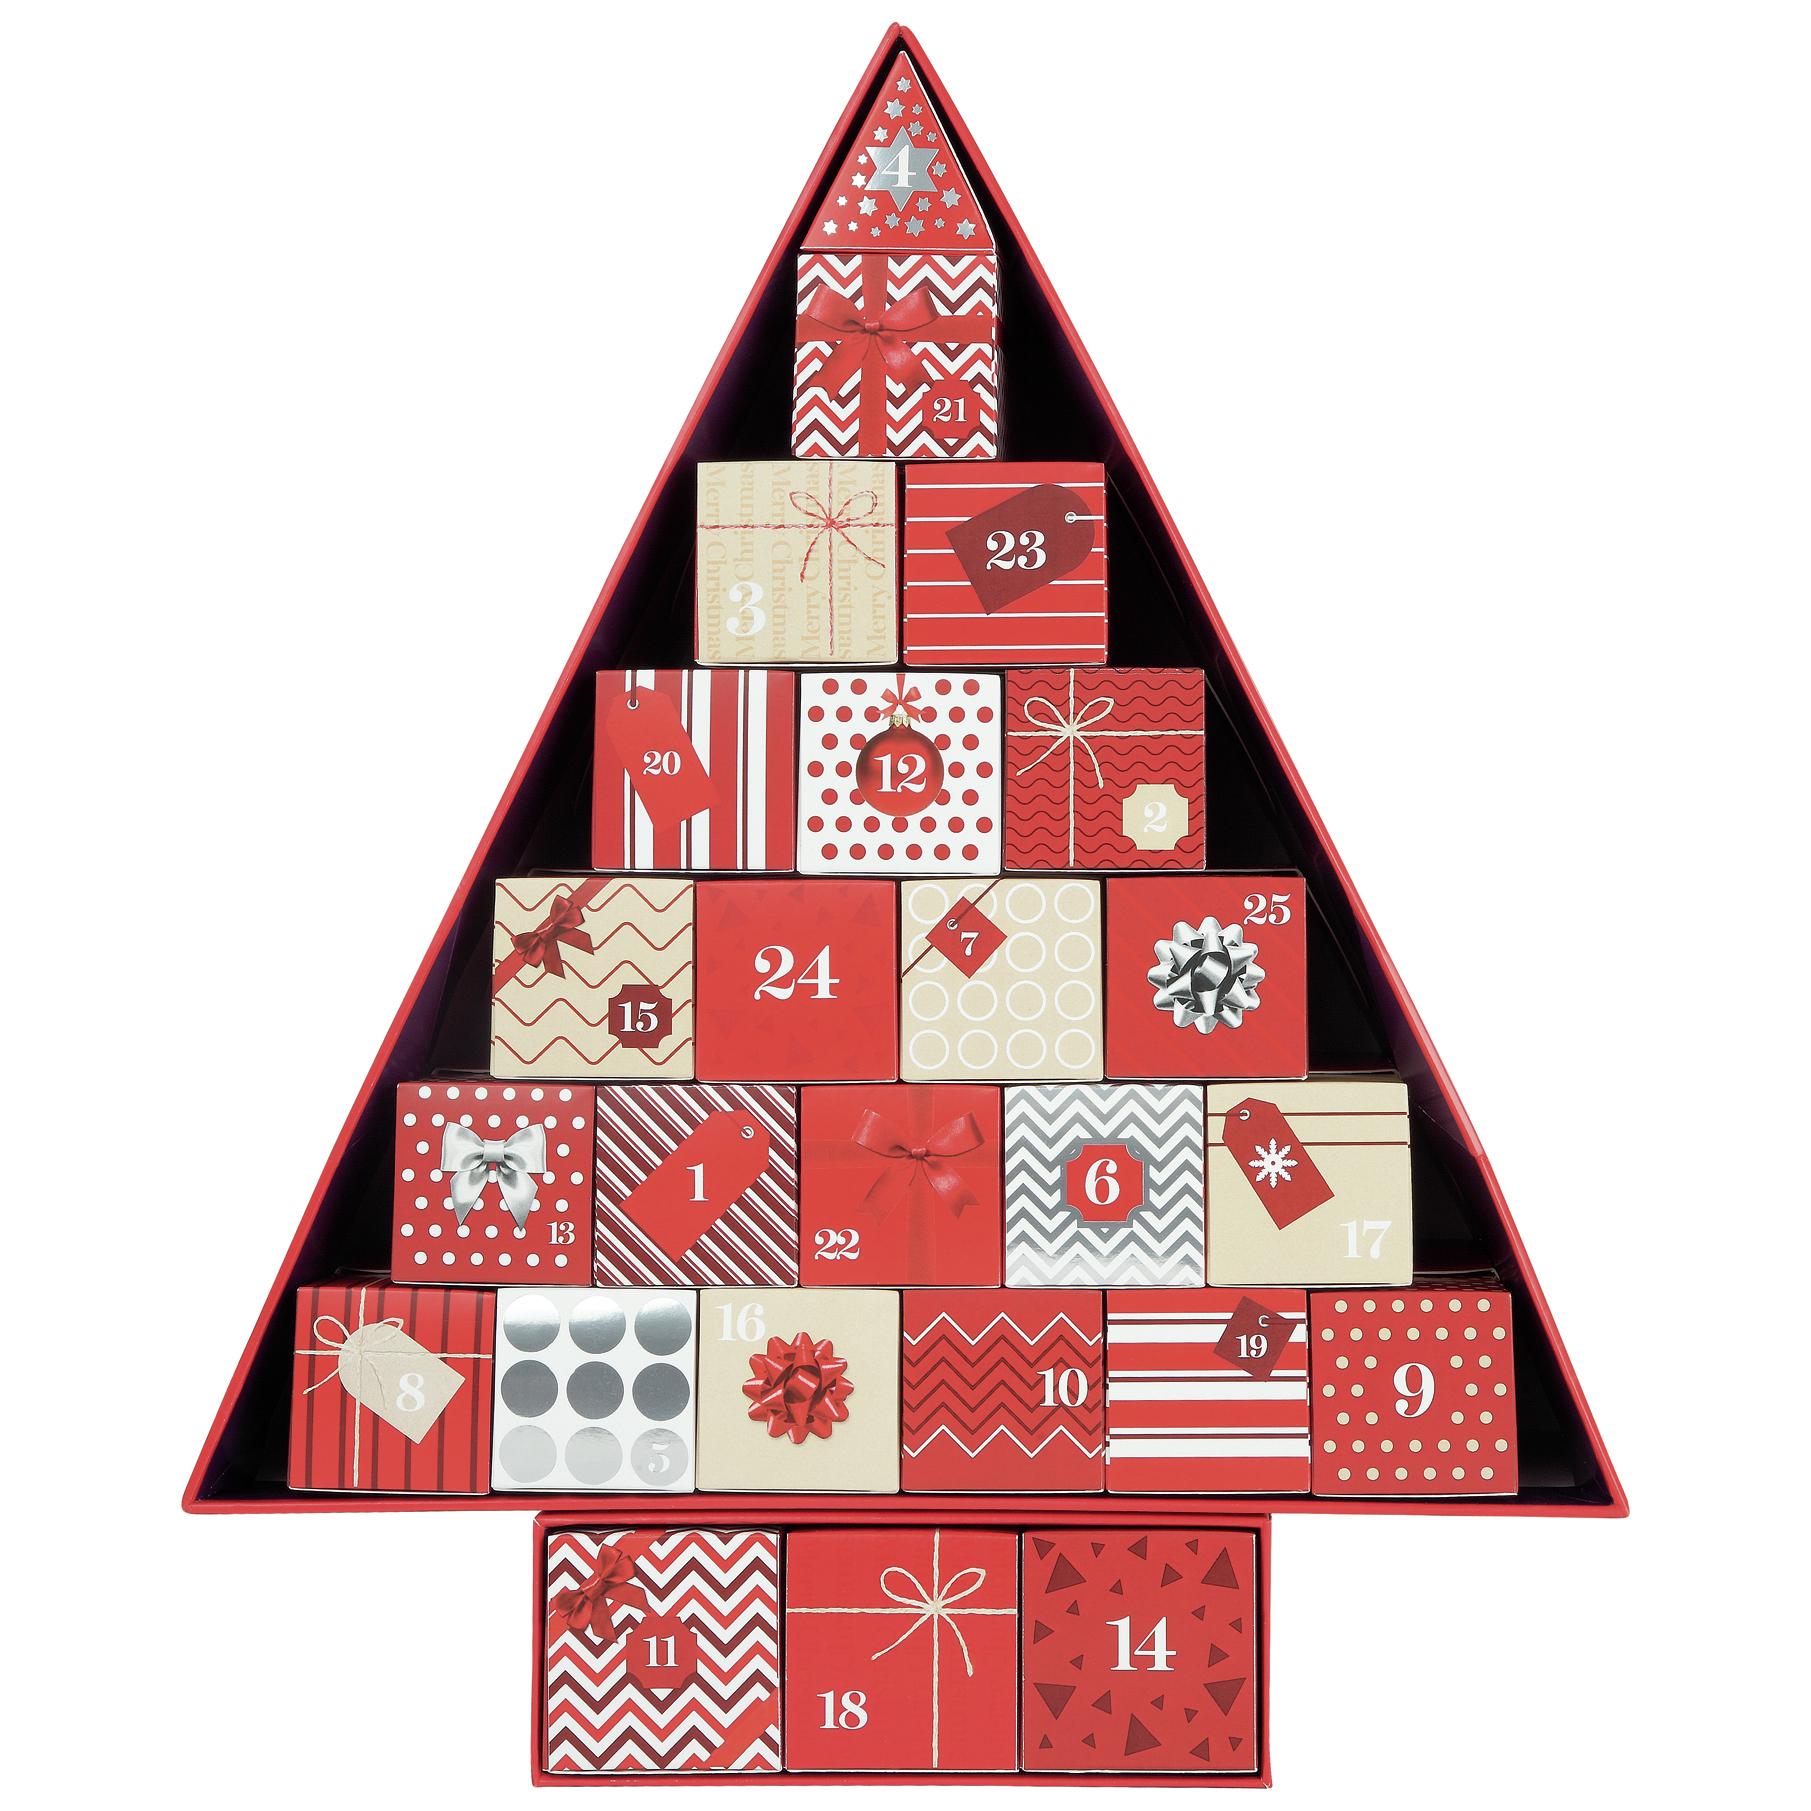 Advent Calendars 2016 : The best advent calendars beauty jewellery more